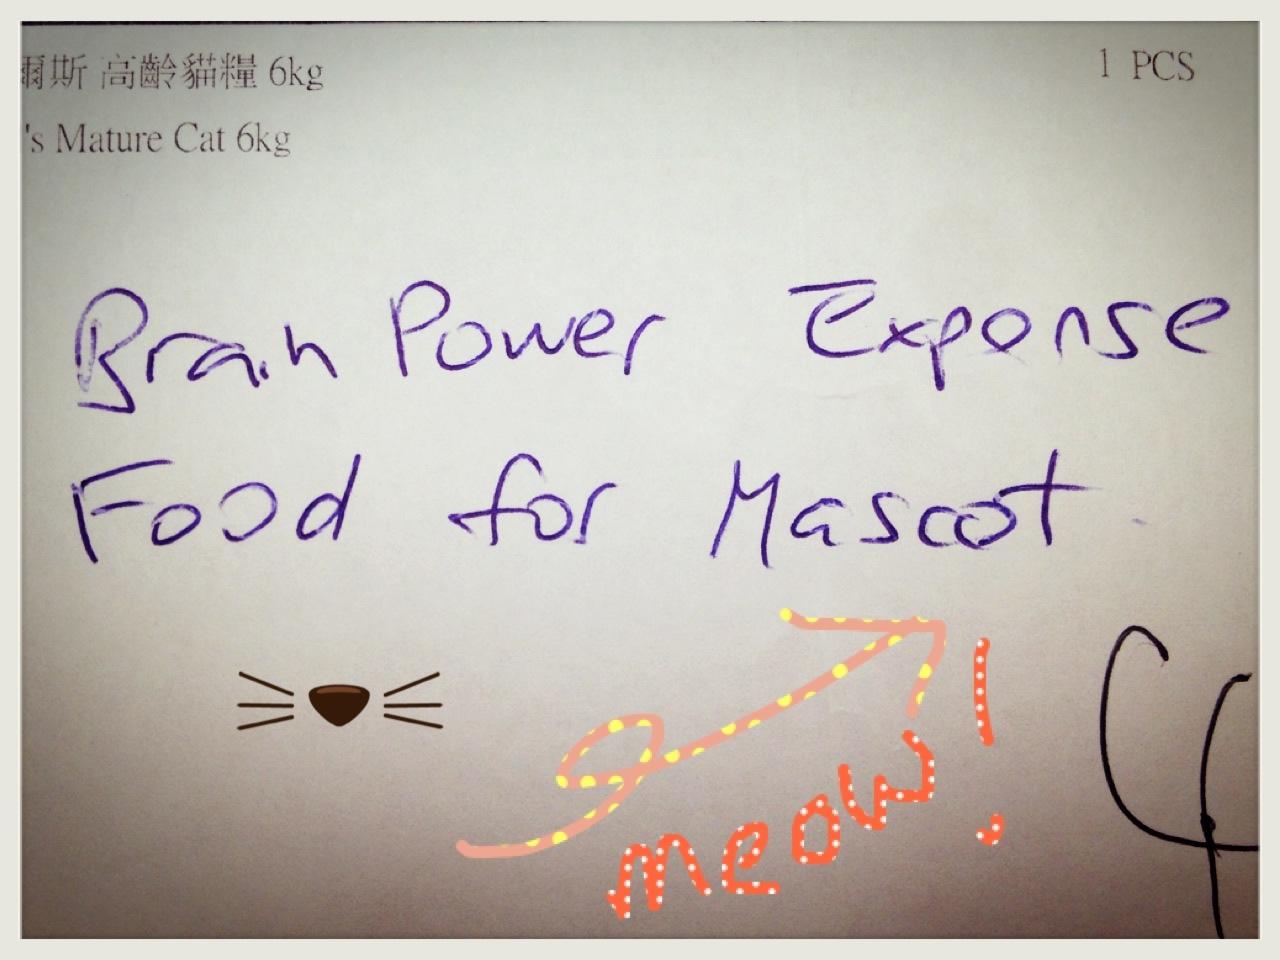 P: Food for Mascot